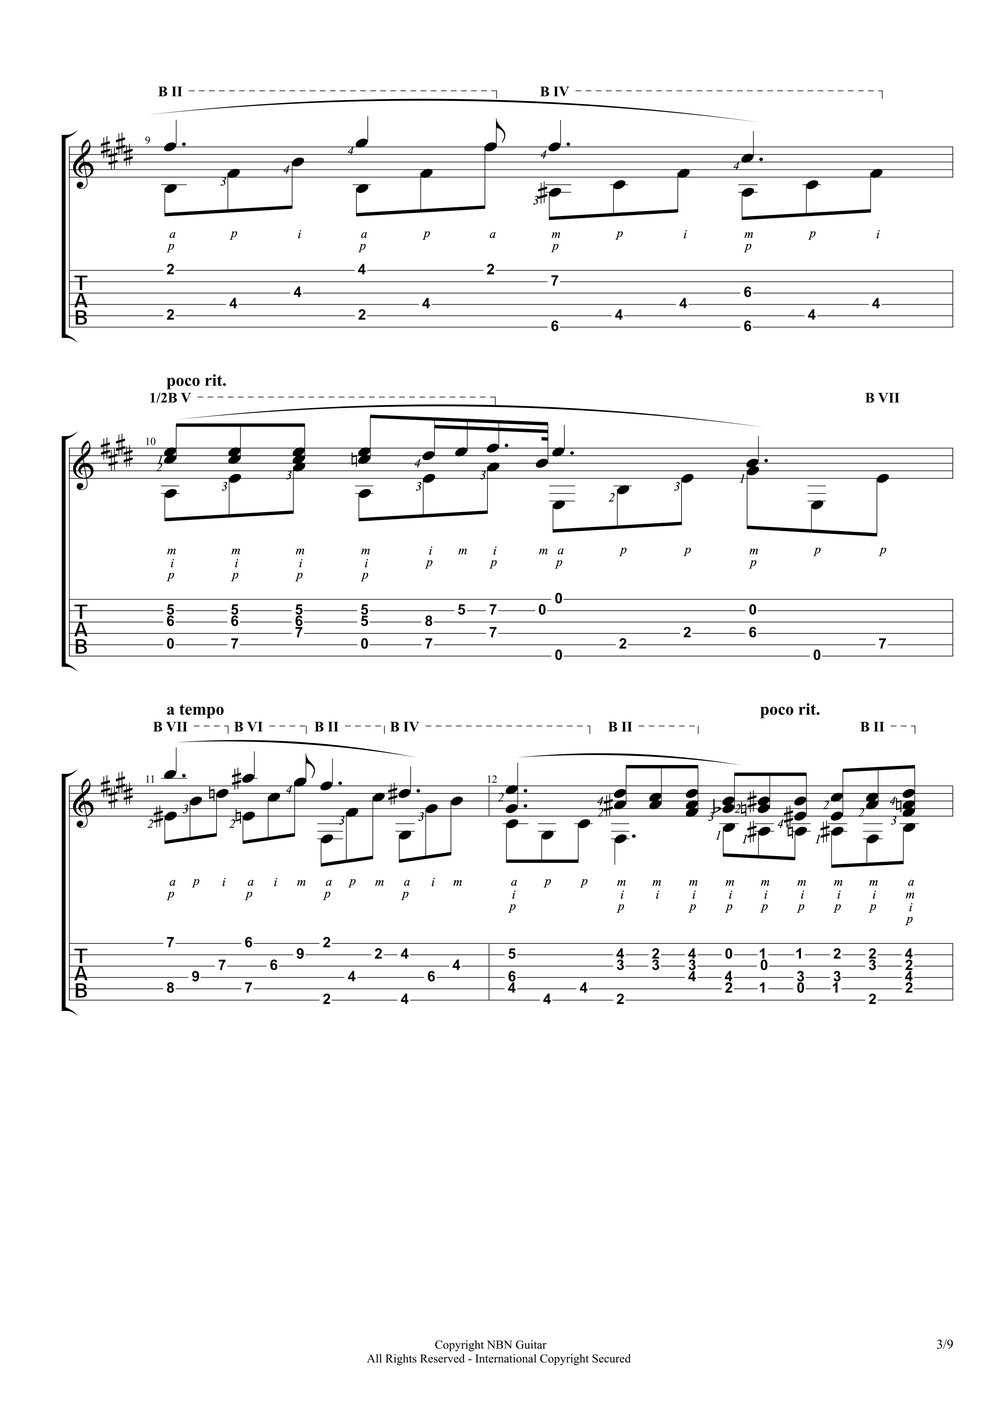 Nocturne in E-flat major (Sheet Music & Tabs)-p05.jpg